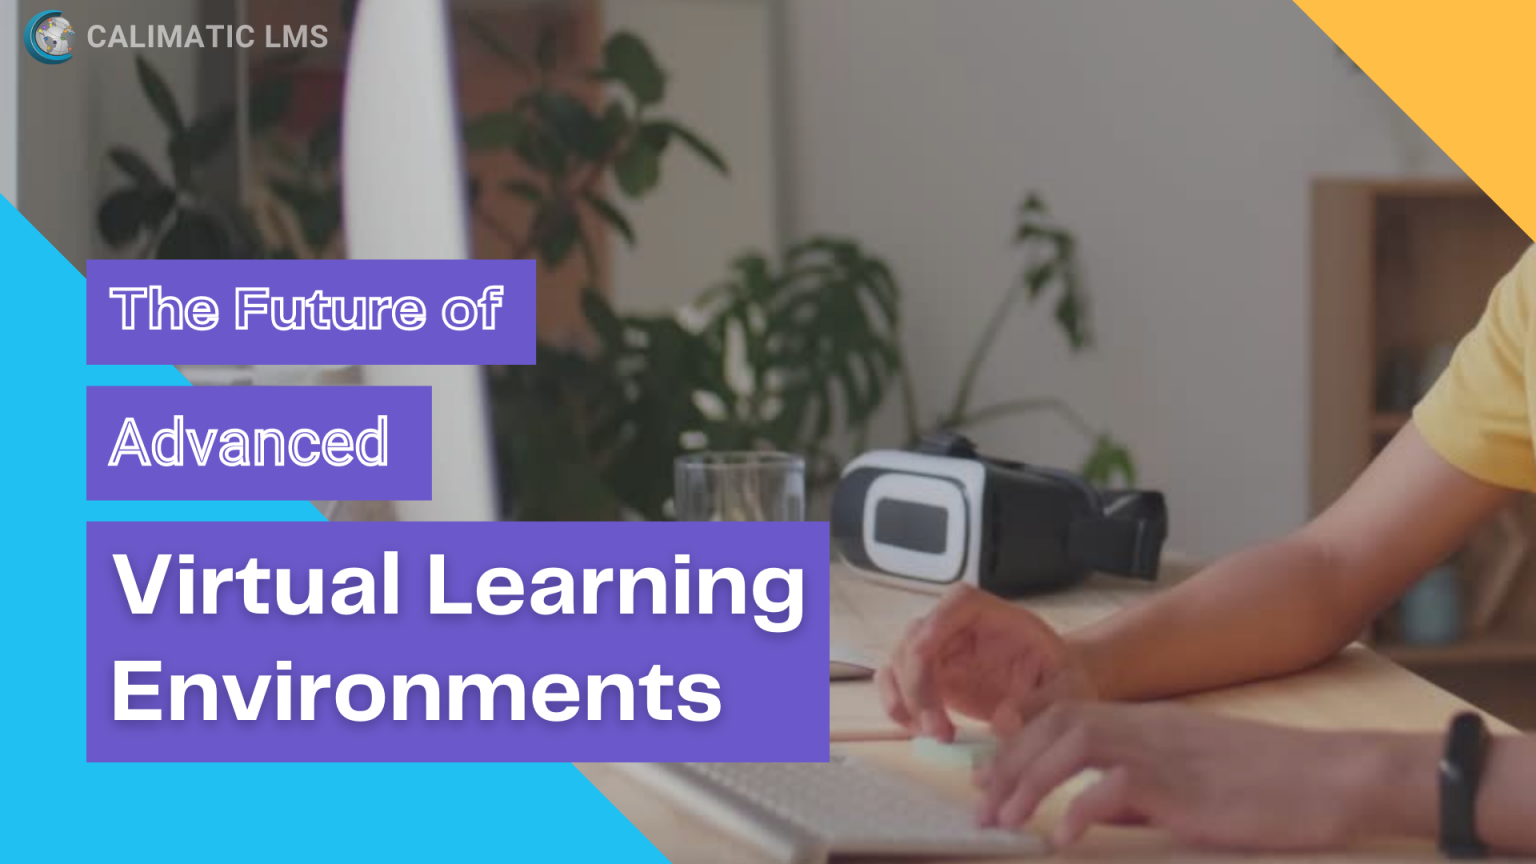 LMS Advanced Virtual Learning